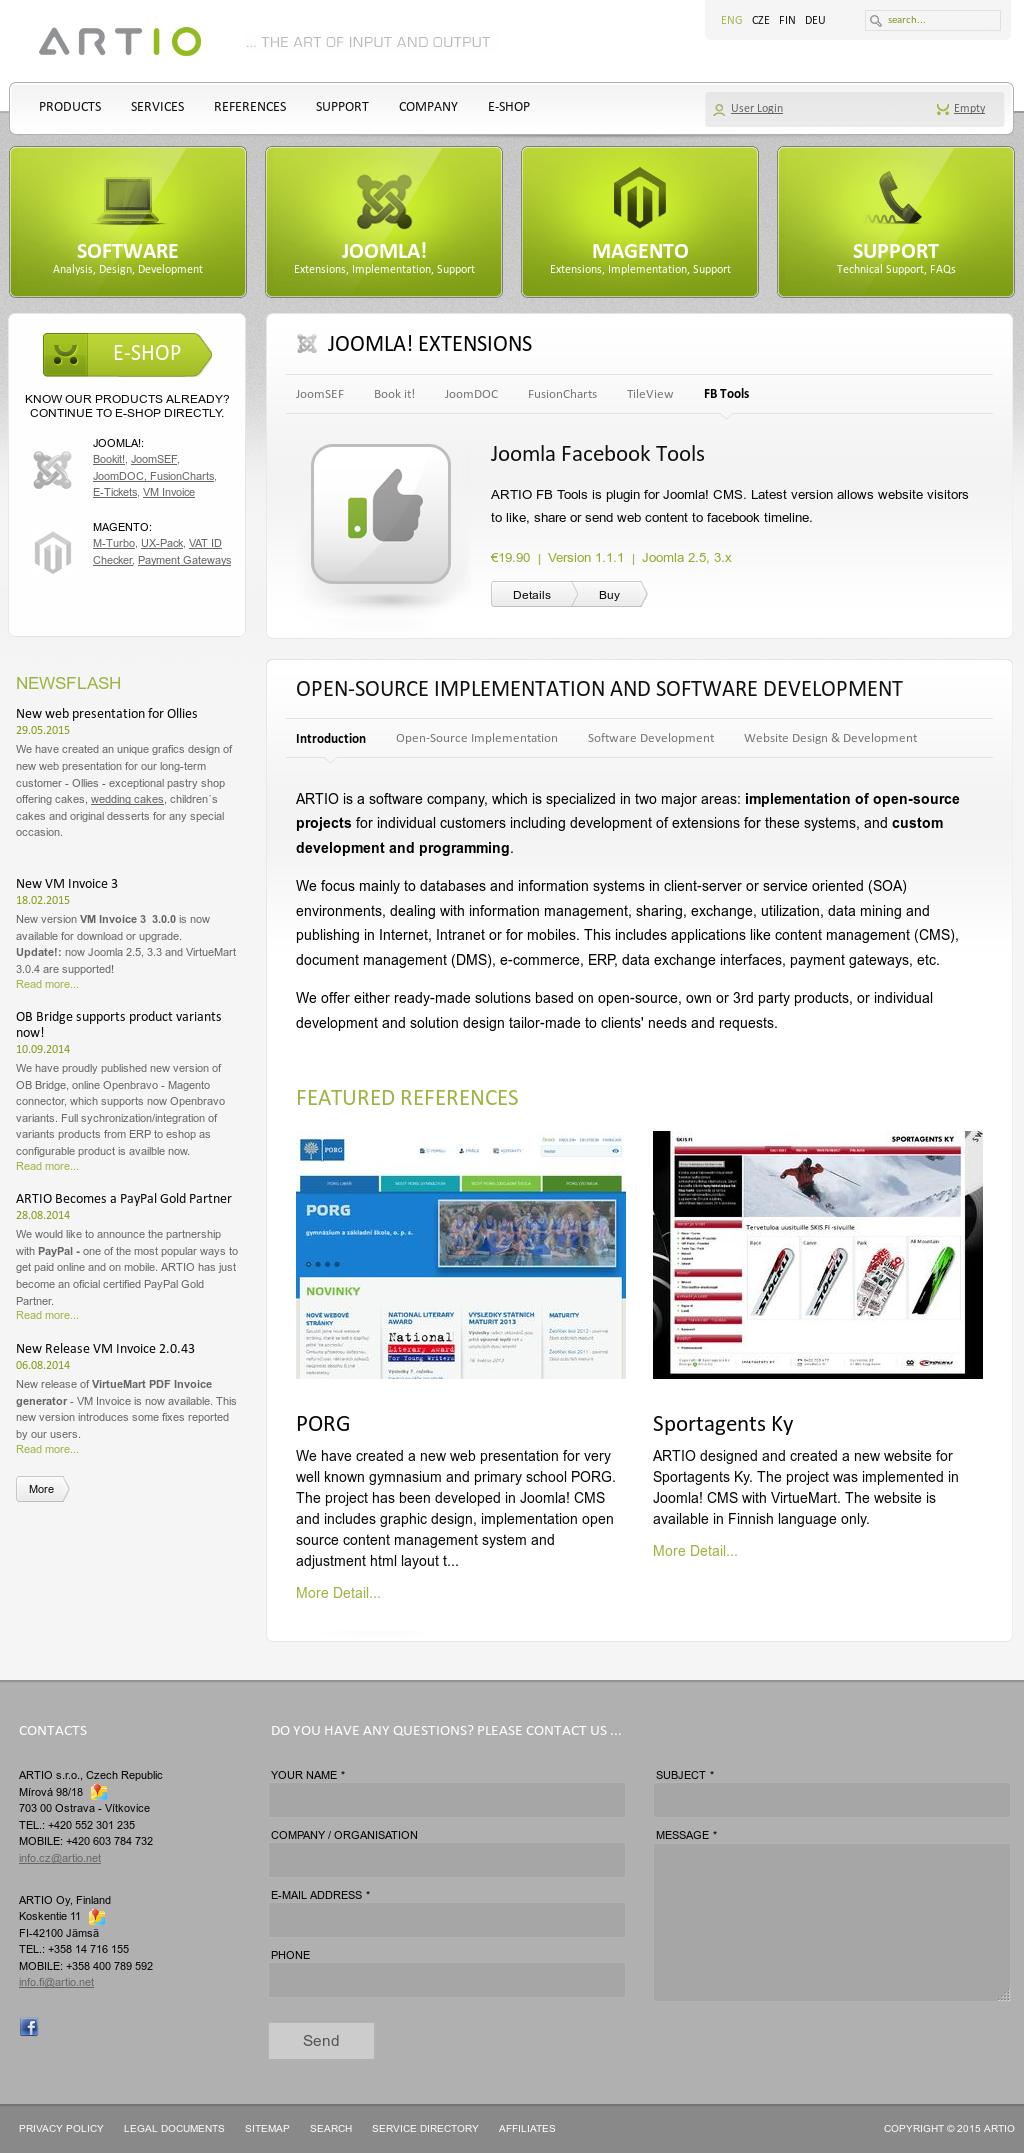 Artio Competitors, Revenue and Employees - Owler Company Profile